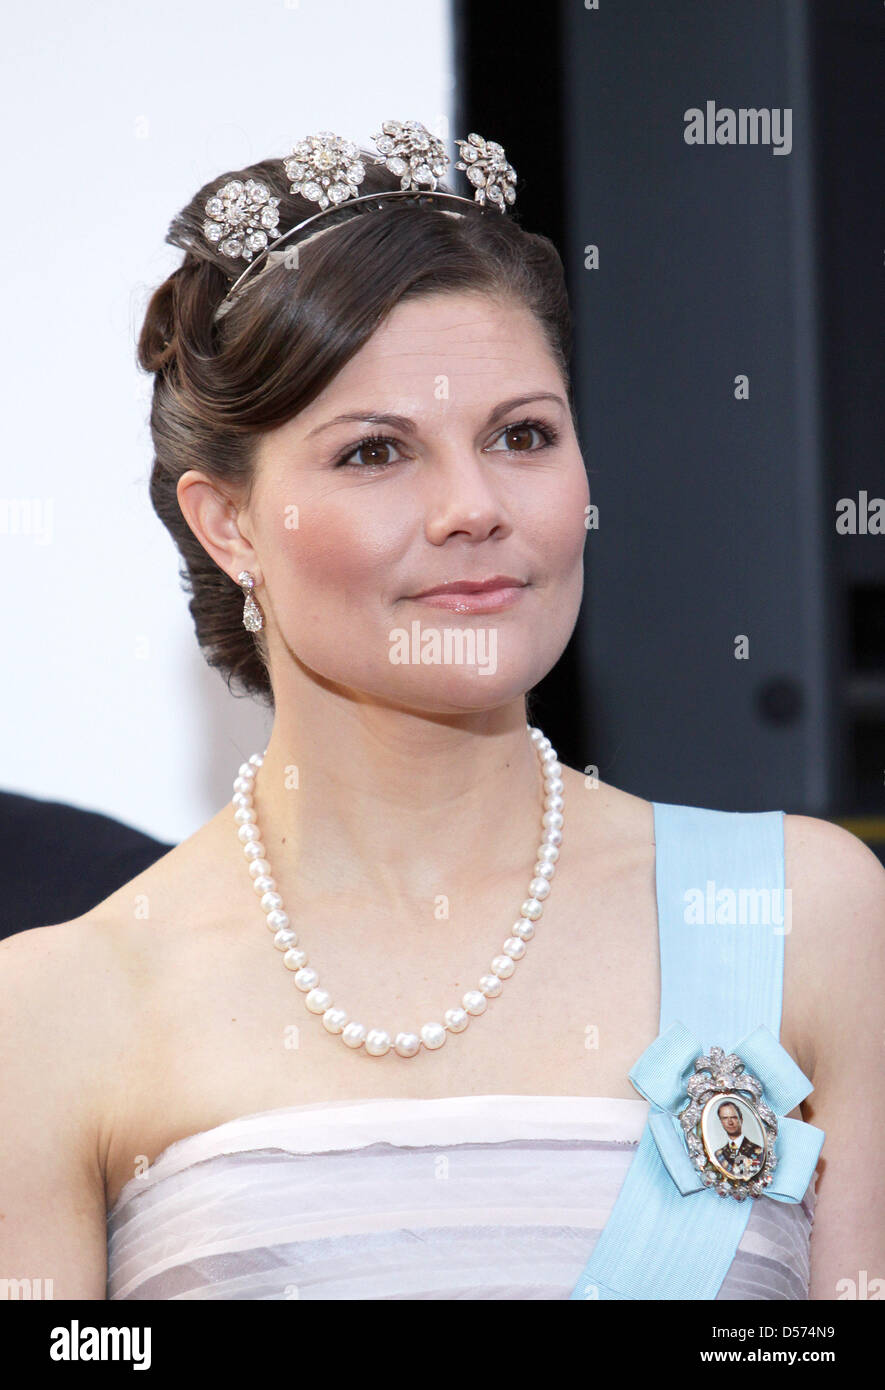 Swedish Crown Braid Tutorial: Swedish Crown Princess Victoria Attends Stock Photos